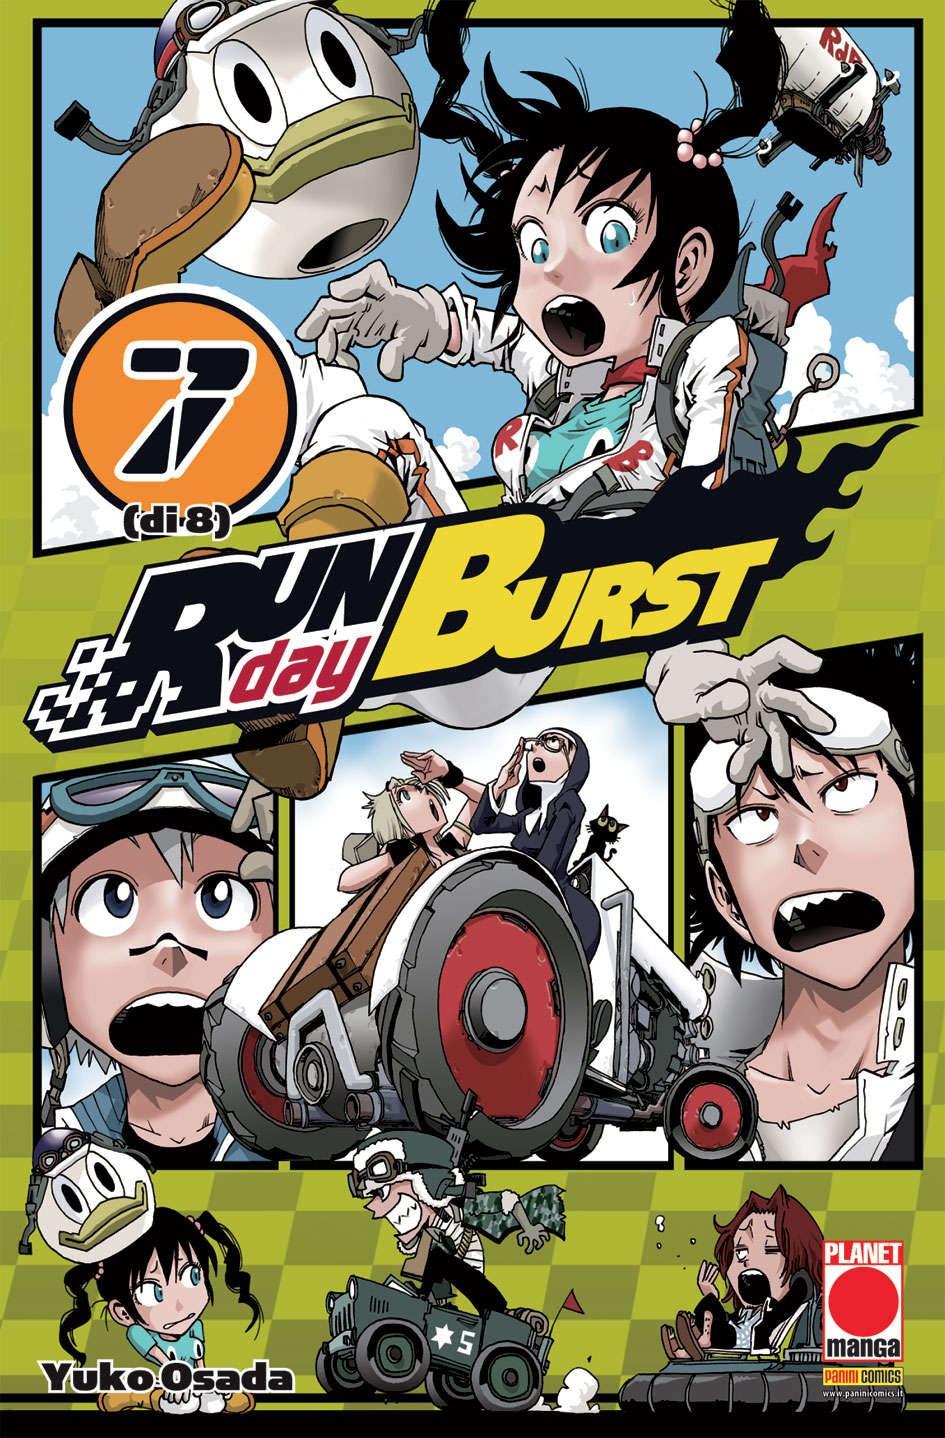 Run Day Burst - N° 7 - Run Day Burst - Planet Manga